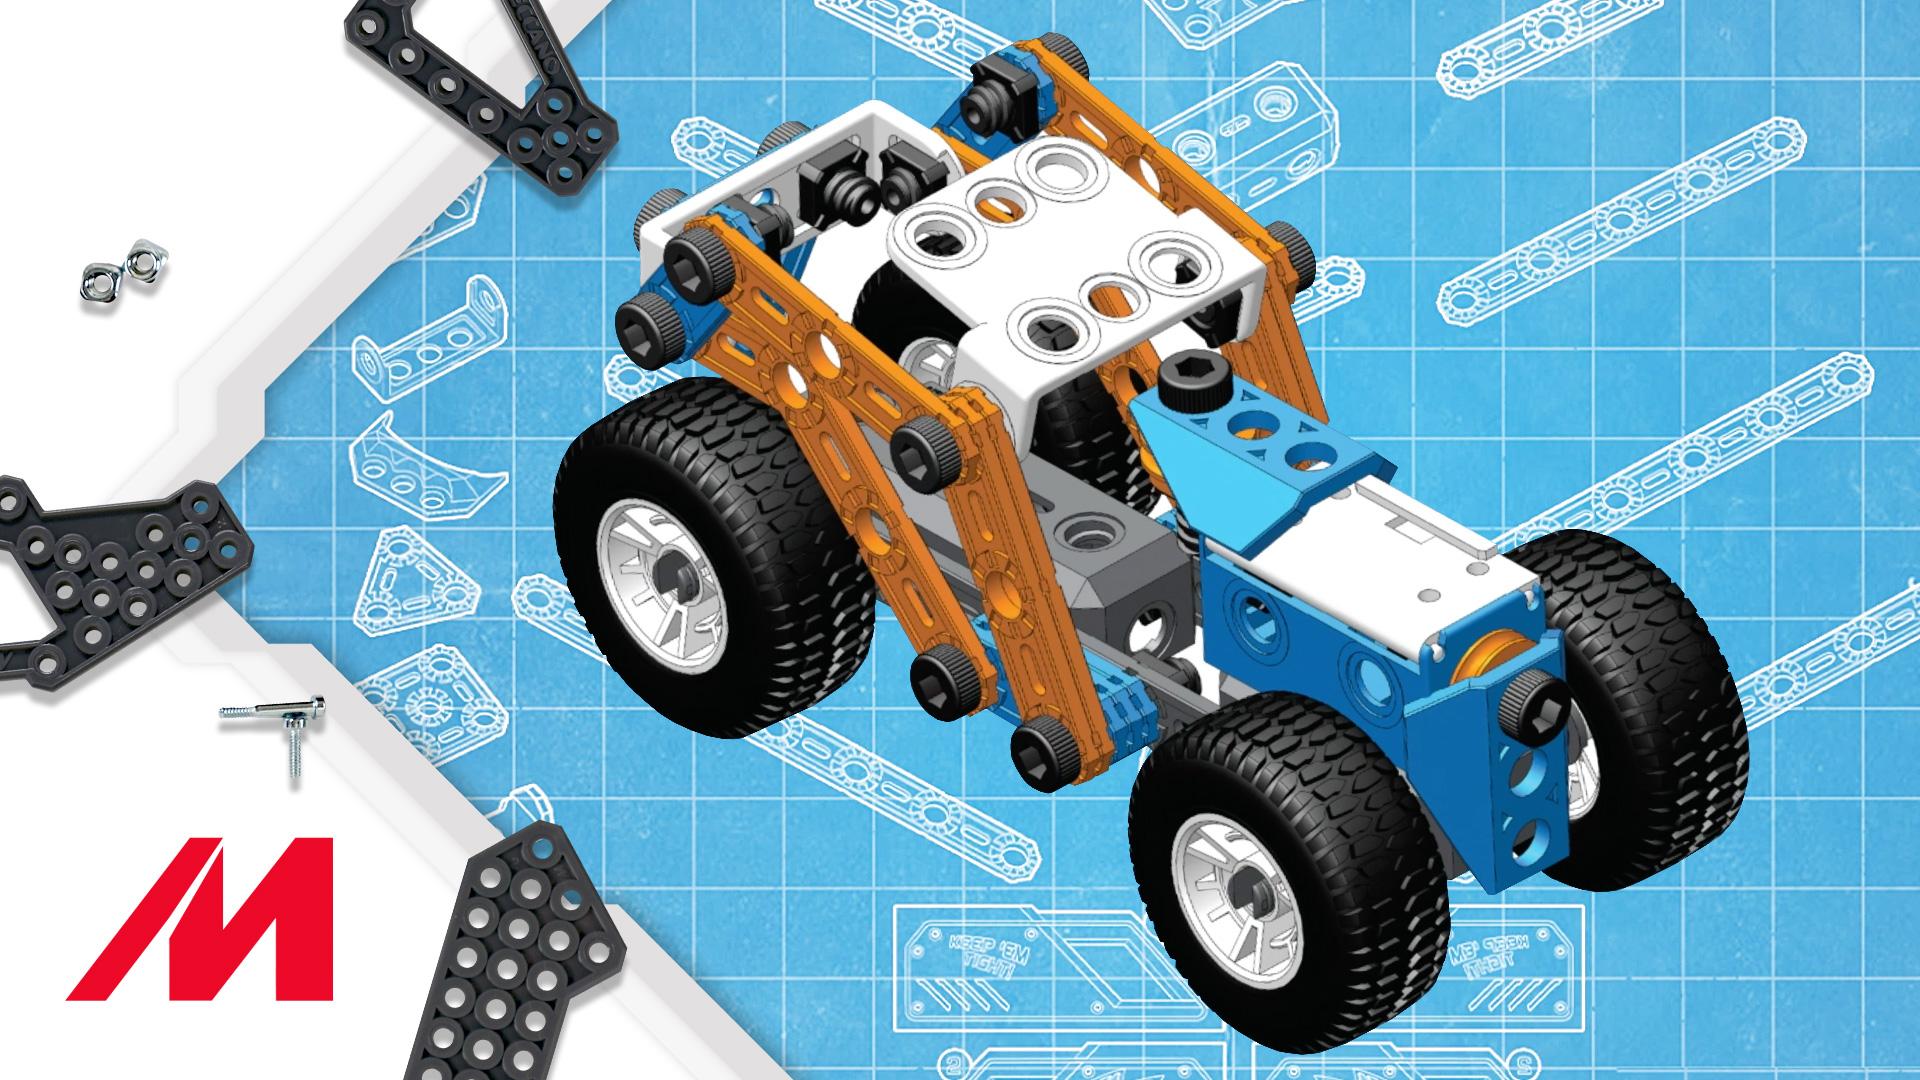 Meccano/Erector Junior | How-To Build Free Play Bucket Build #4